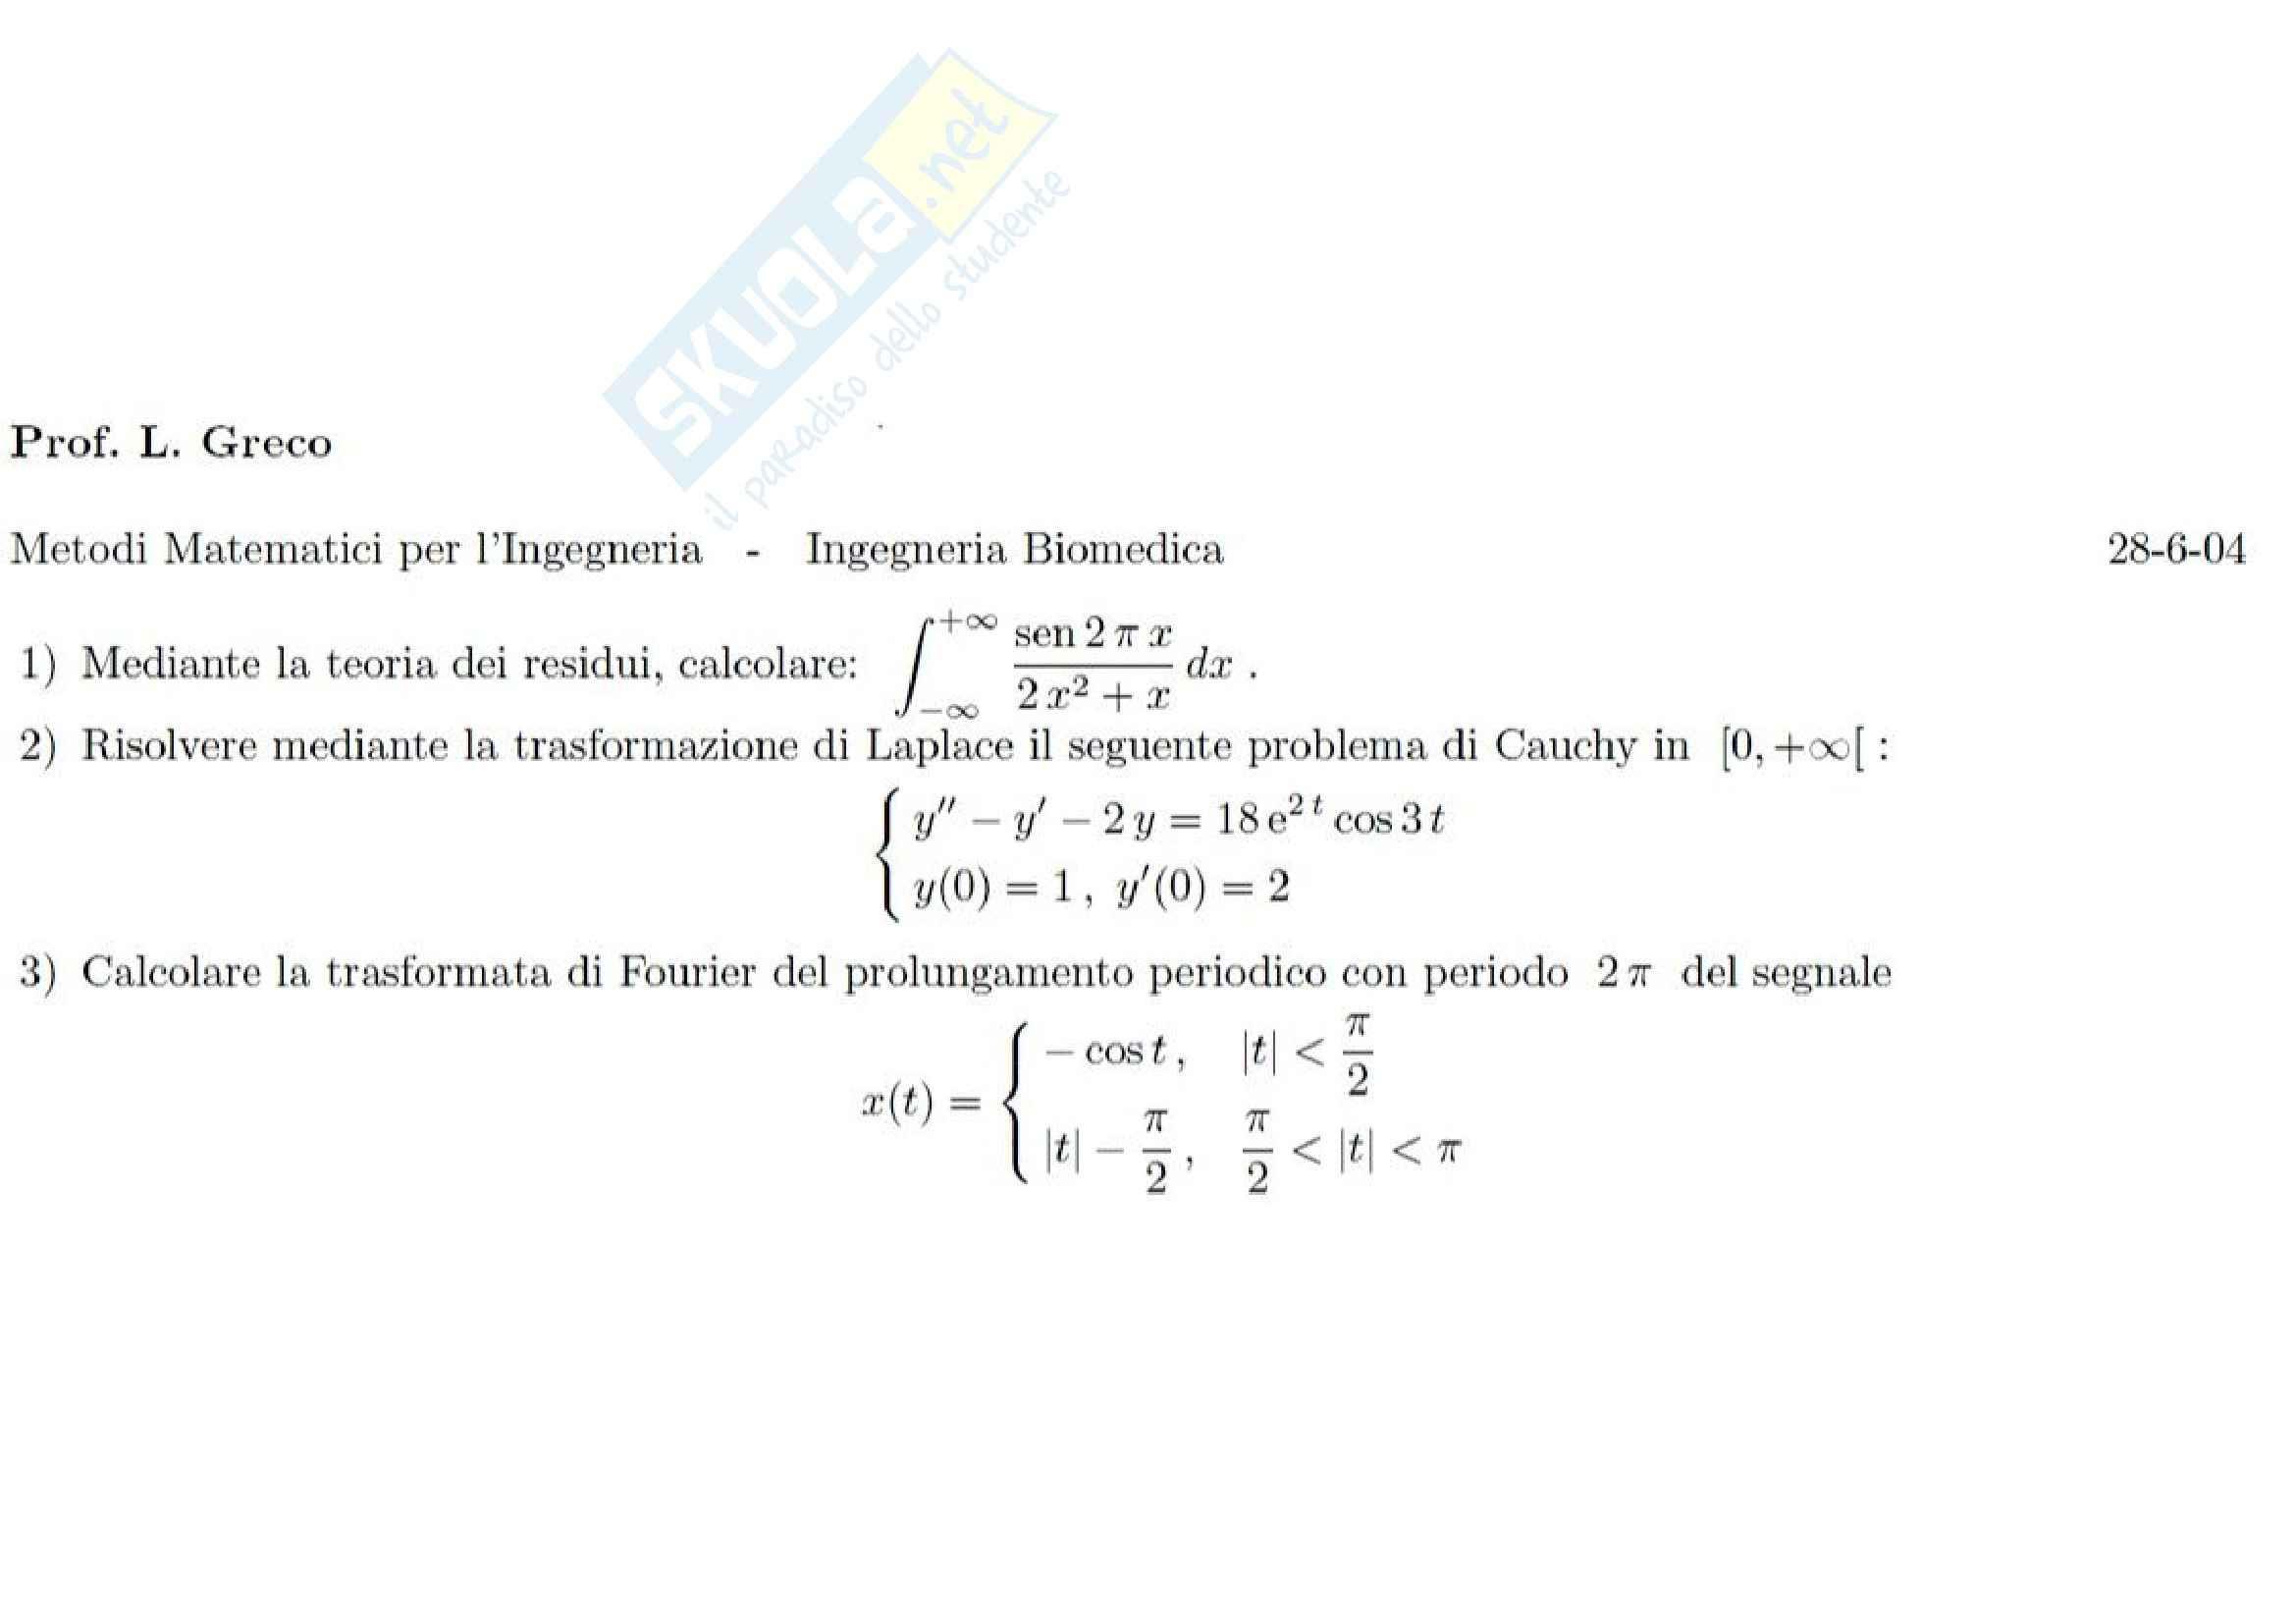 Metodi matematici per l'ingegneria - Esercizi vari